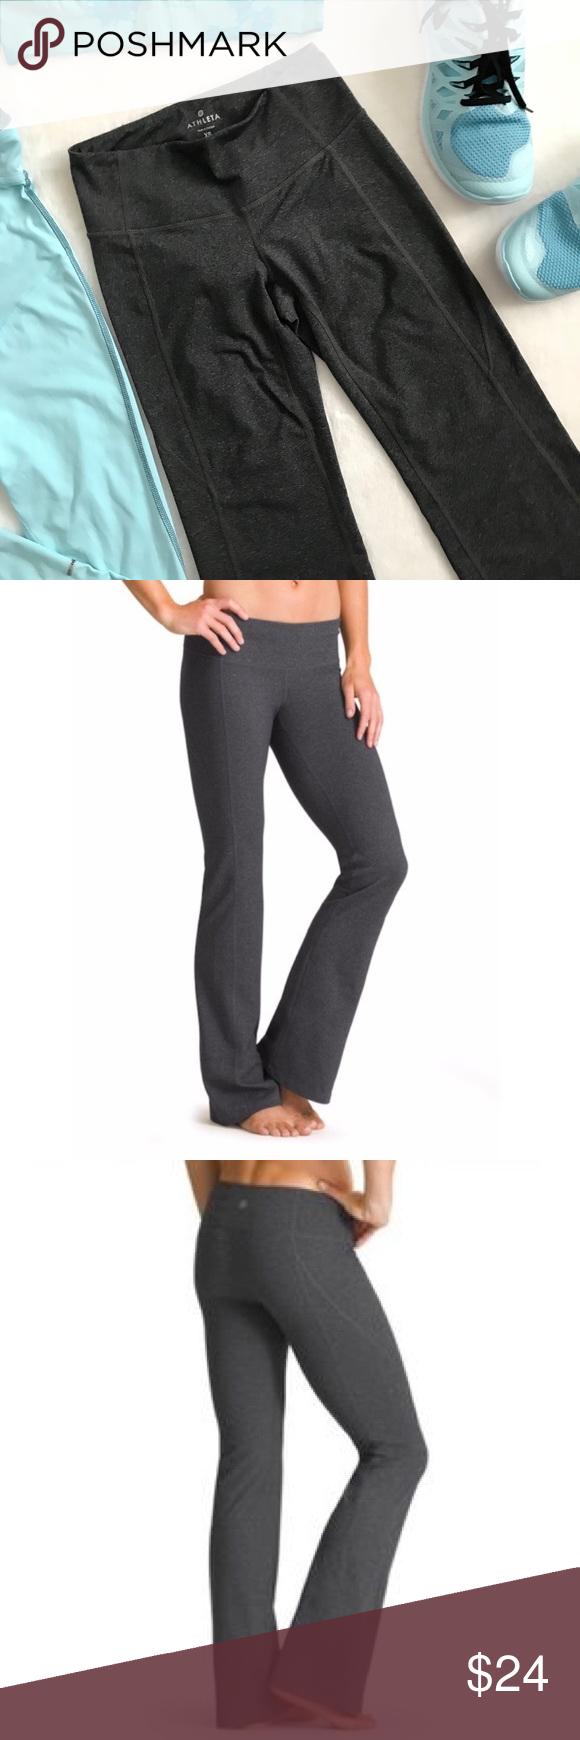 26740711ea Athleta Dark Gray Revelation Yoga Pant Size XS In EUC!! Athleta dark gray  Revelation